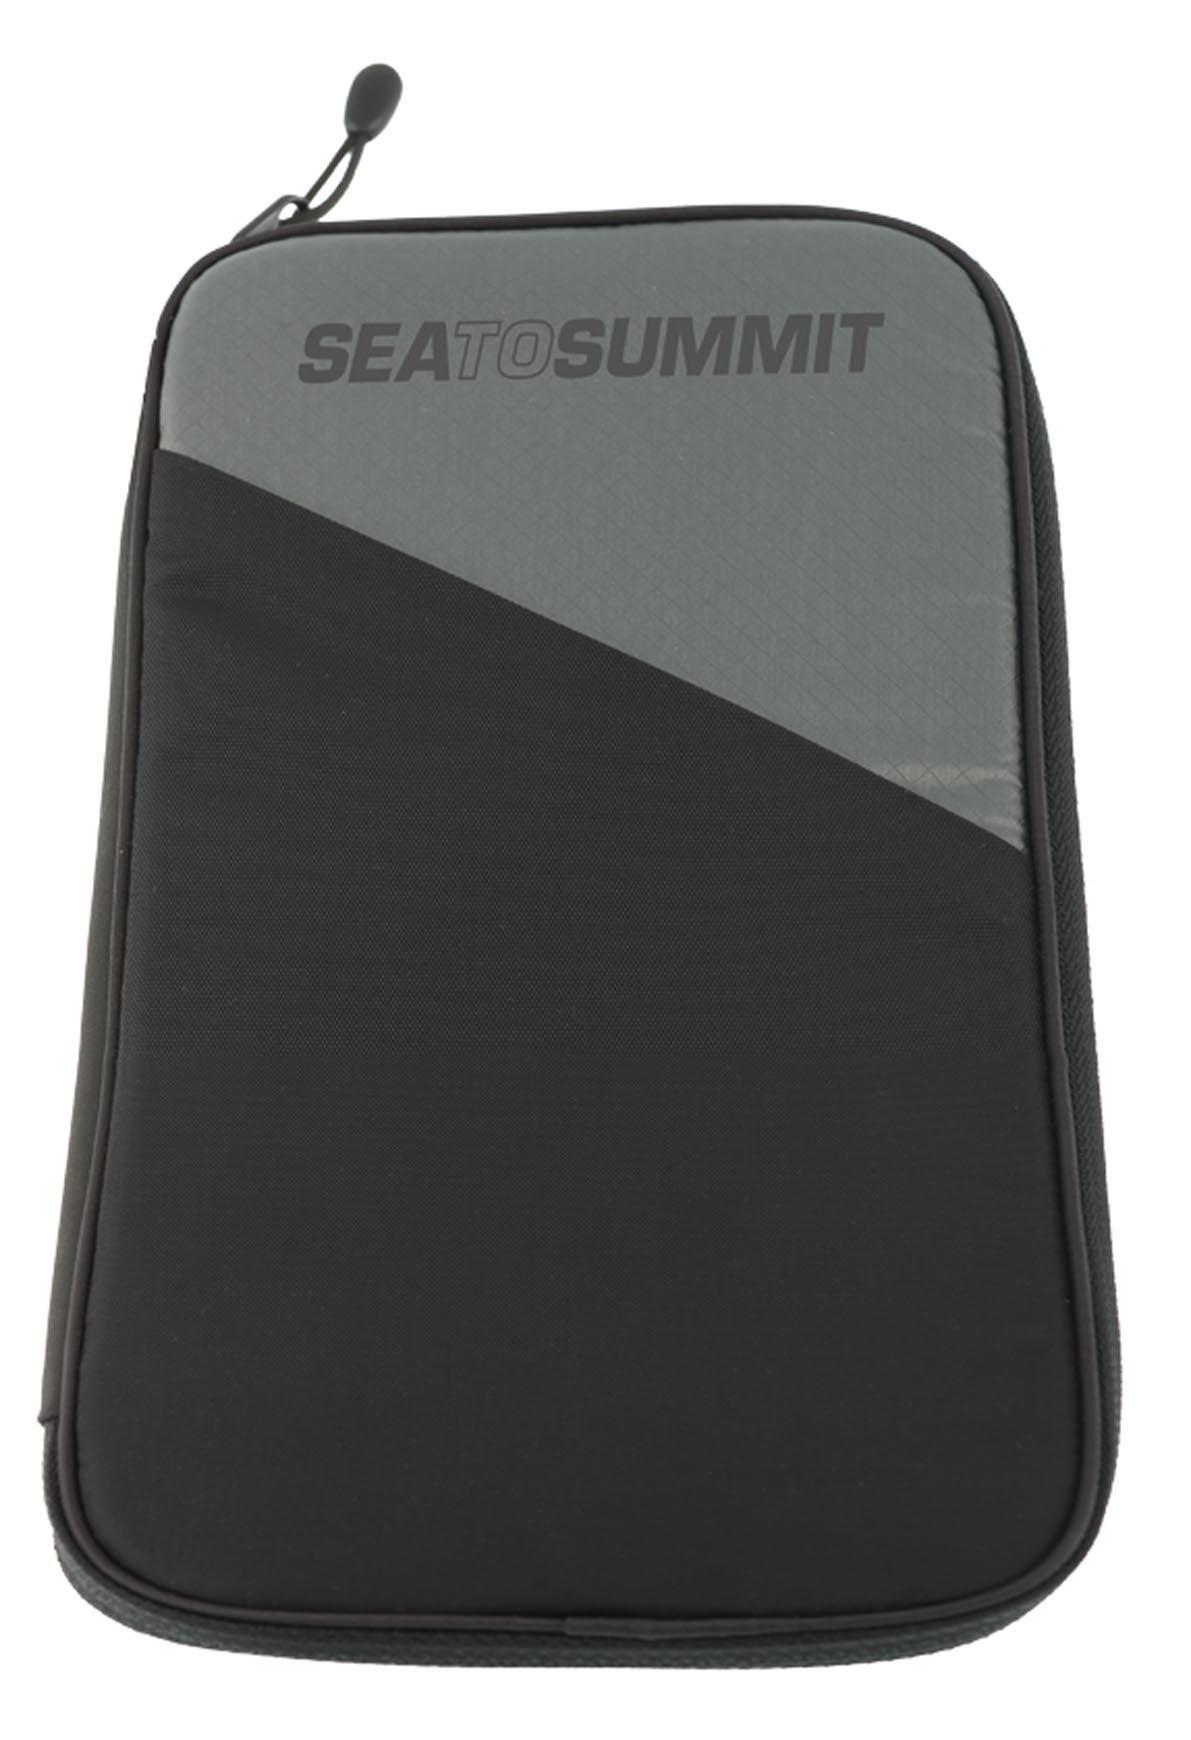 Sea to summit porte monnaie rfid protect accessories for Porte monnaie